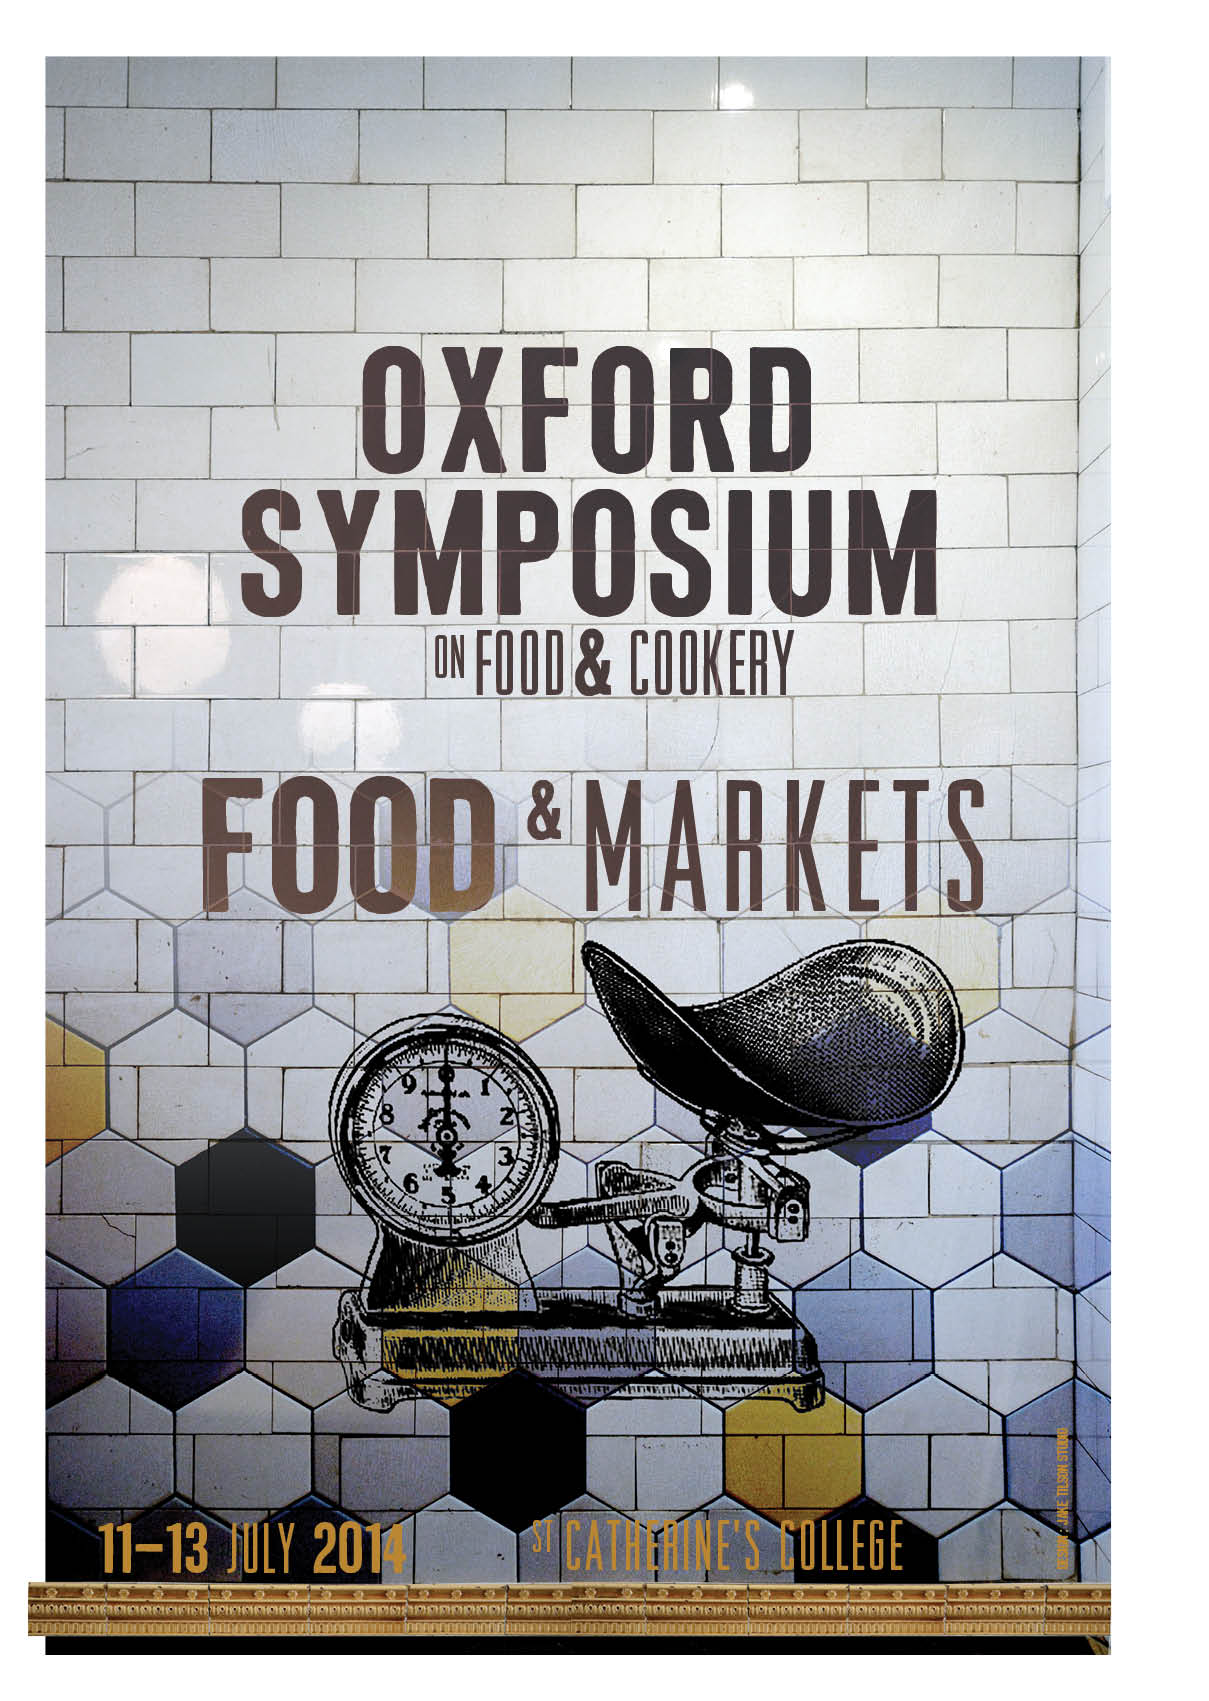 James Knight @ oxford food